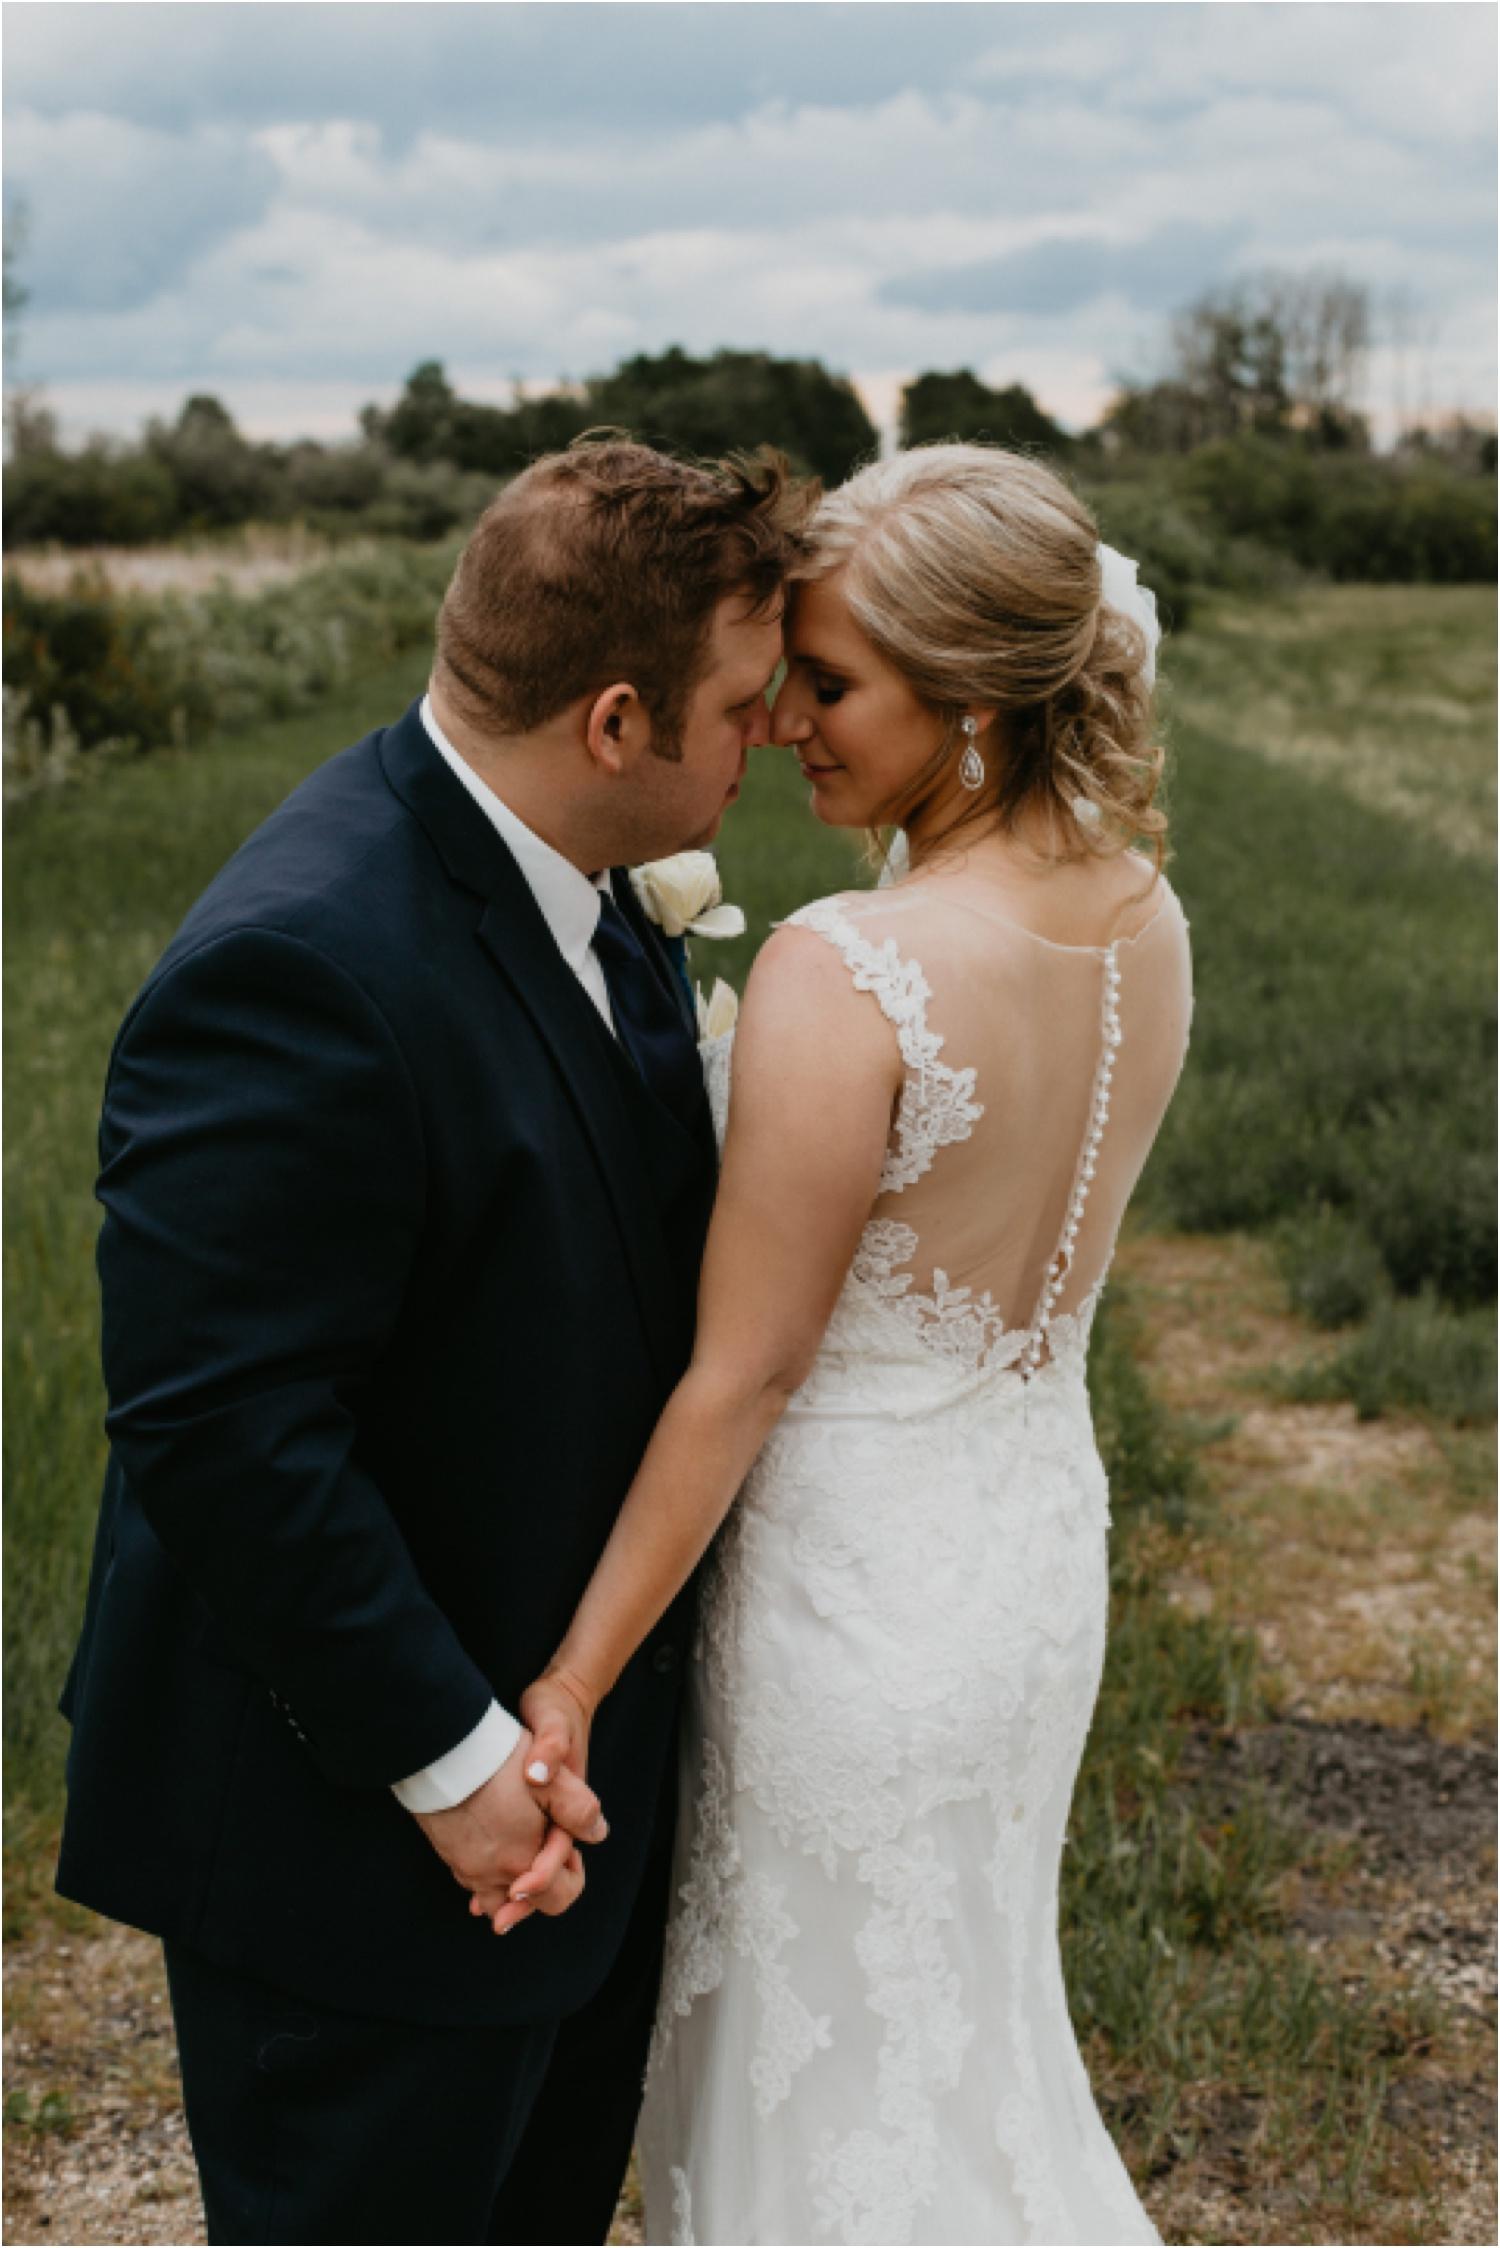 Kailey_Carter_Saskatchewan_Wedding (463 of 727).jpg